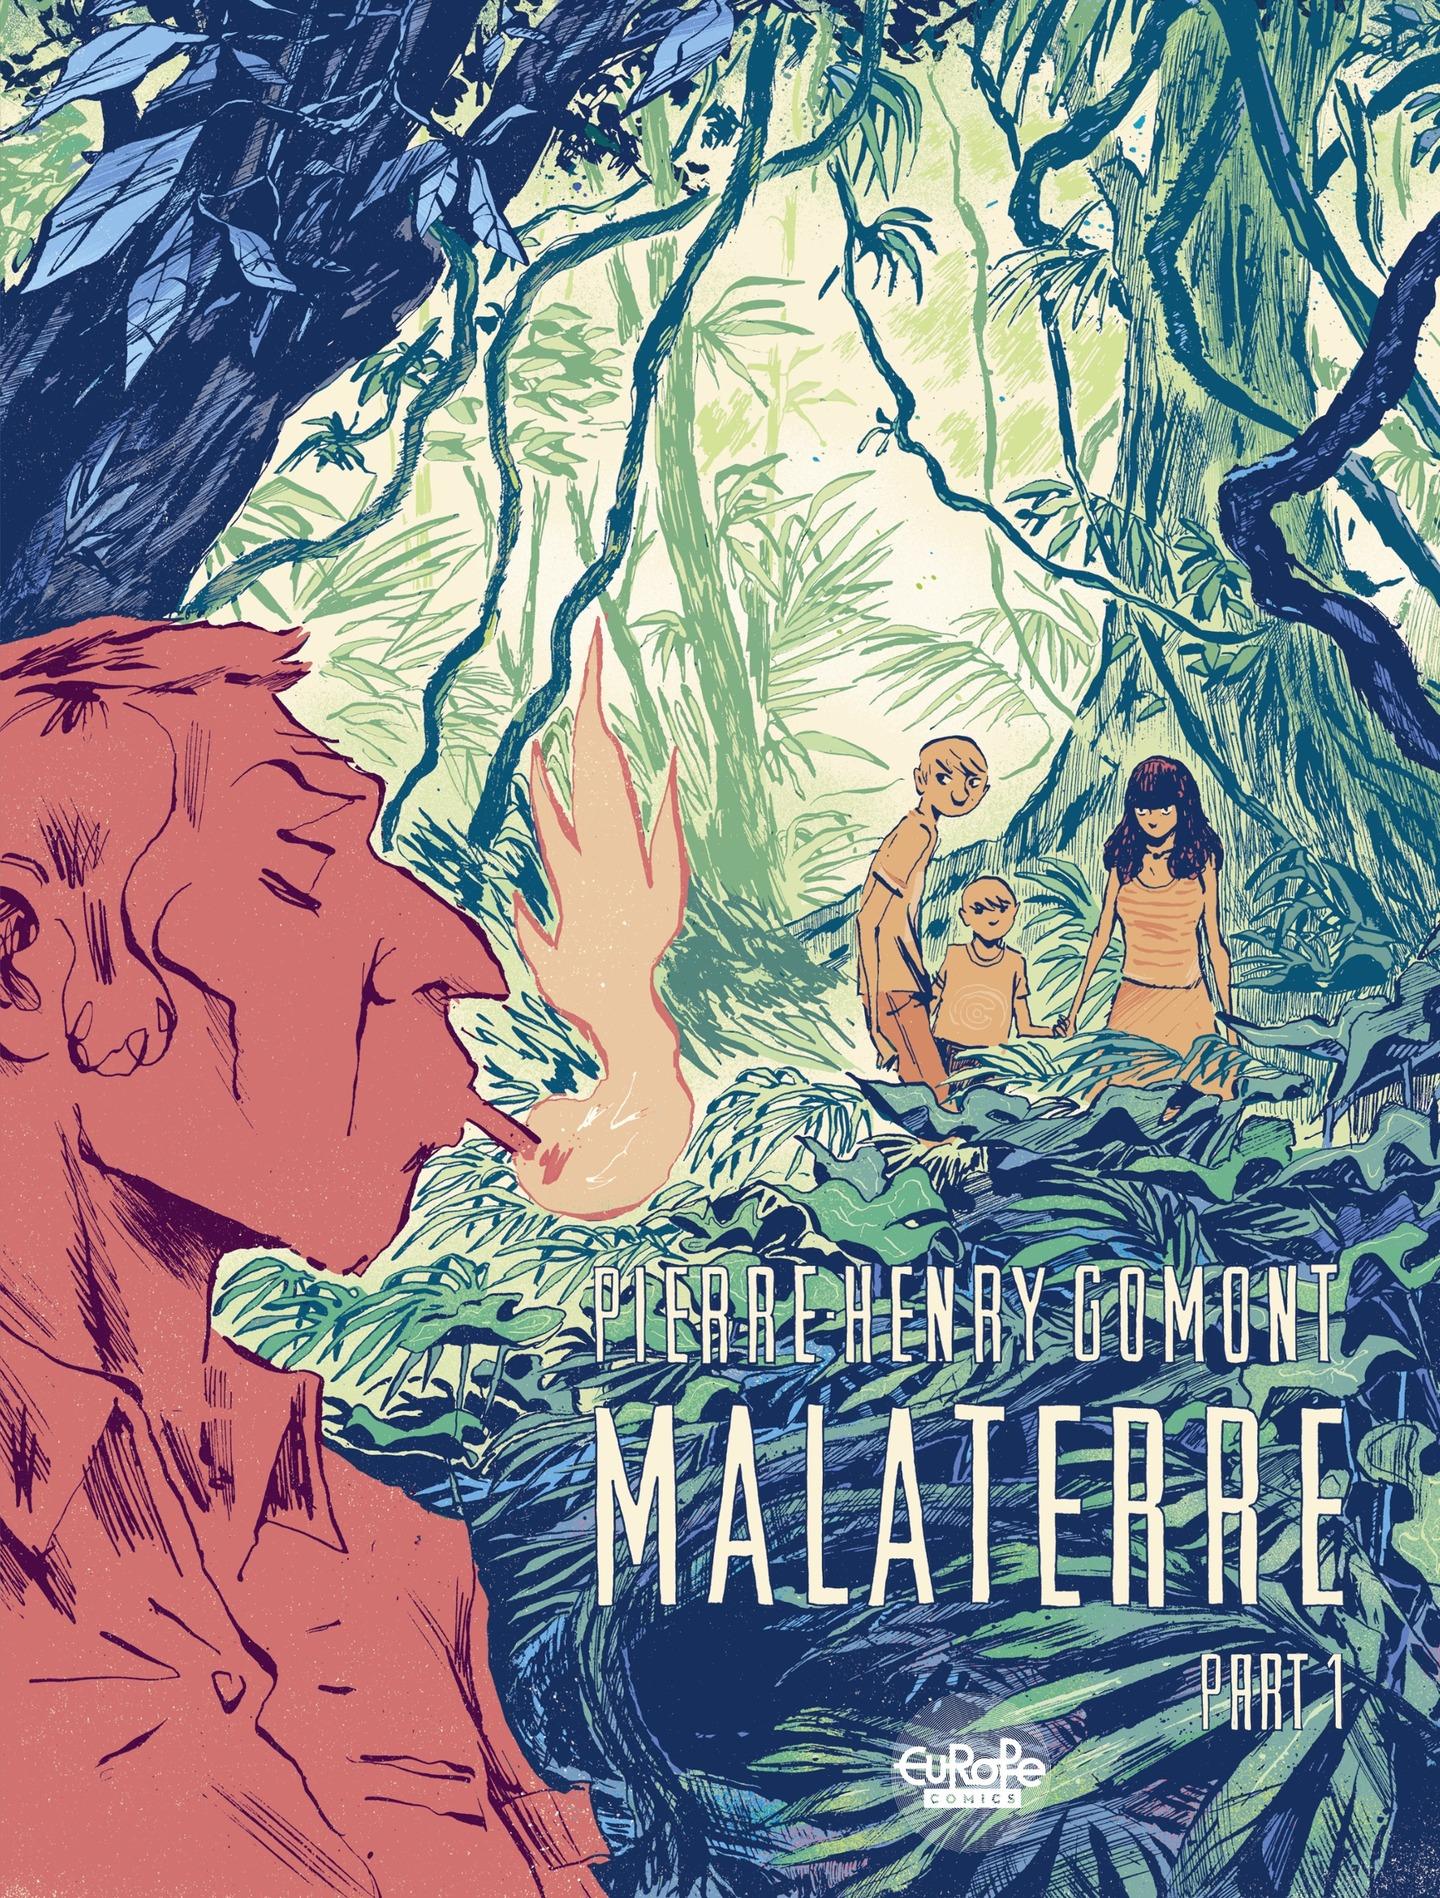 Malaterre: Part 1